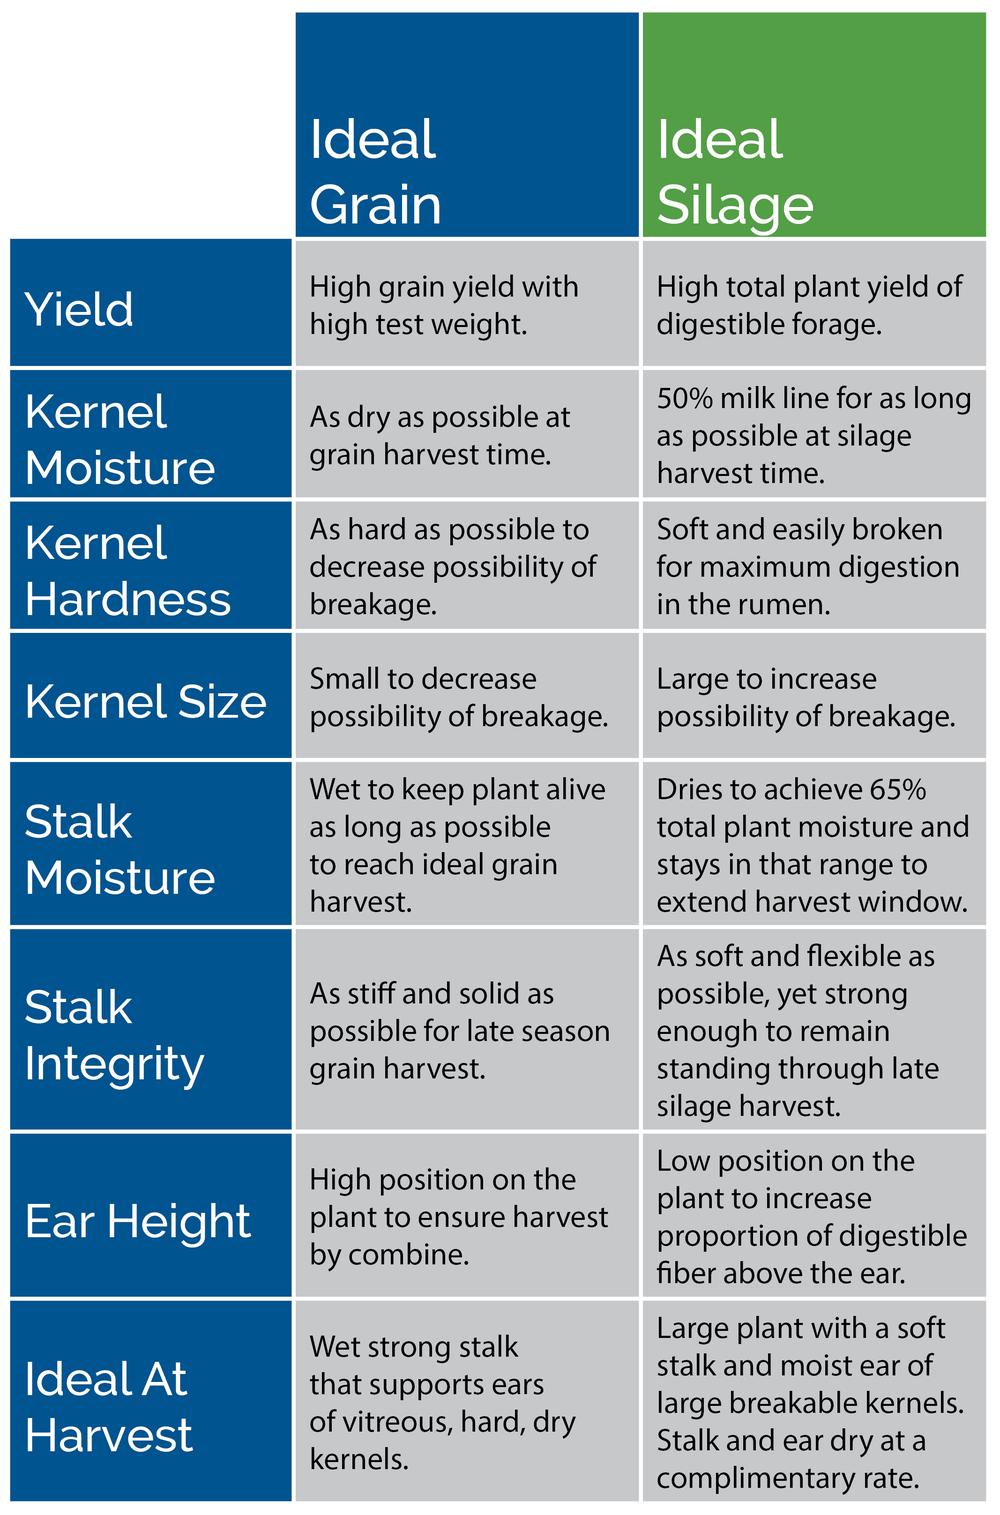 ideal-grain-corn-versus-ideal-silage-corn-characteristics.jpg